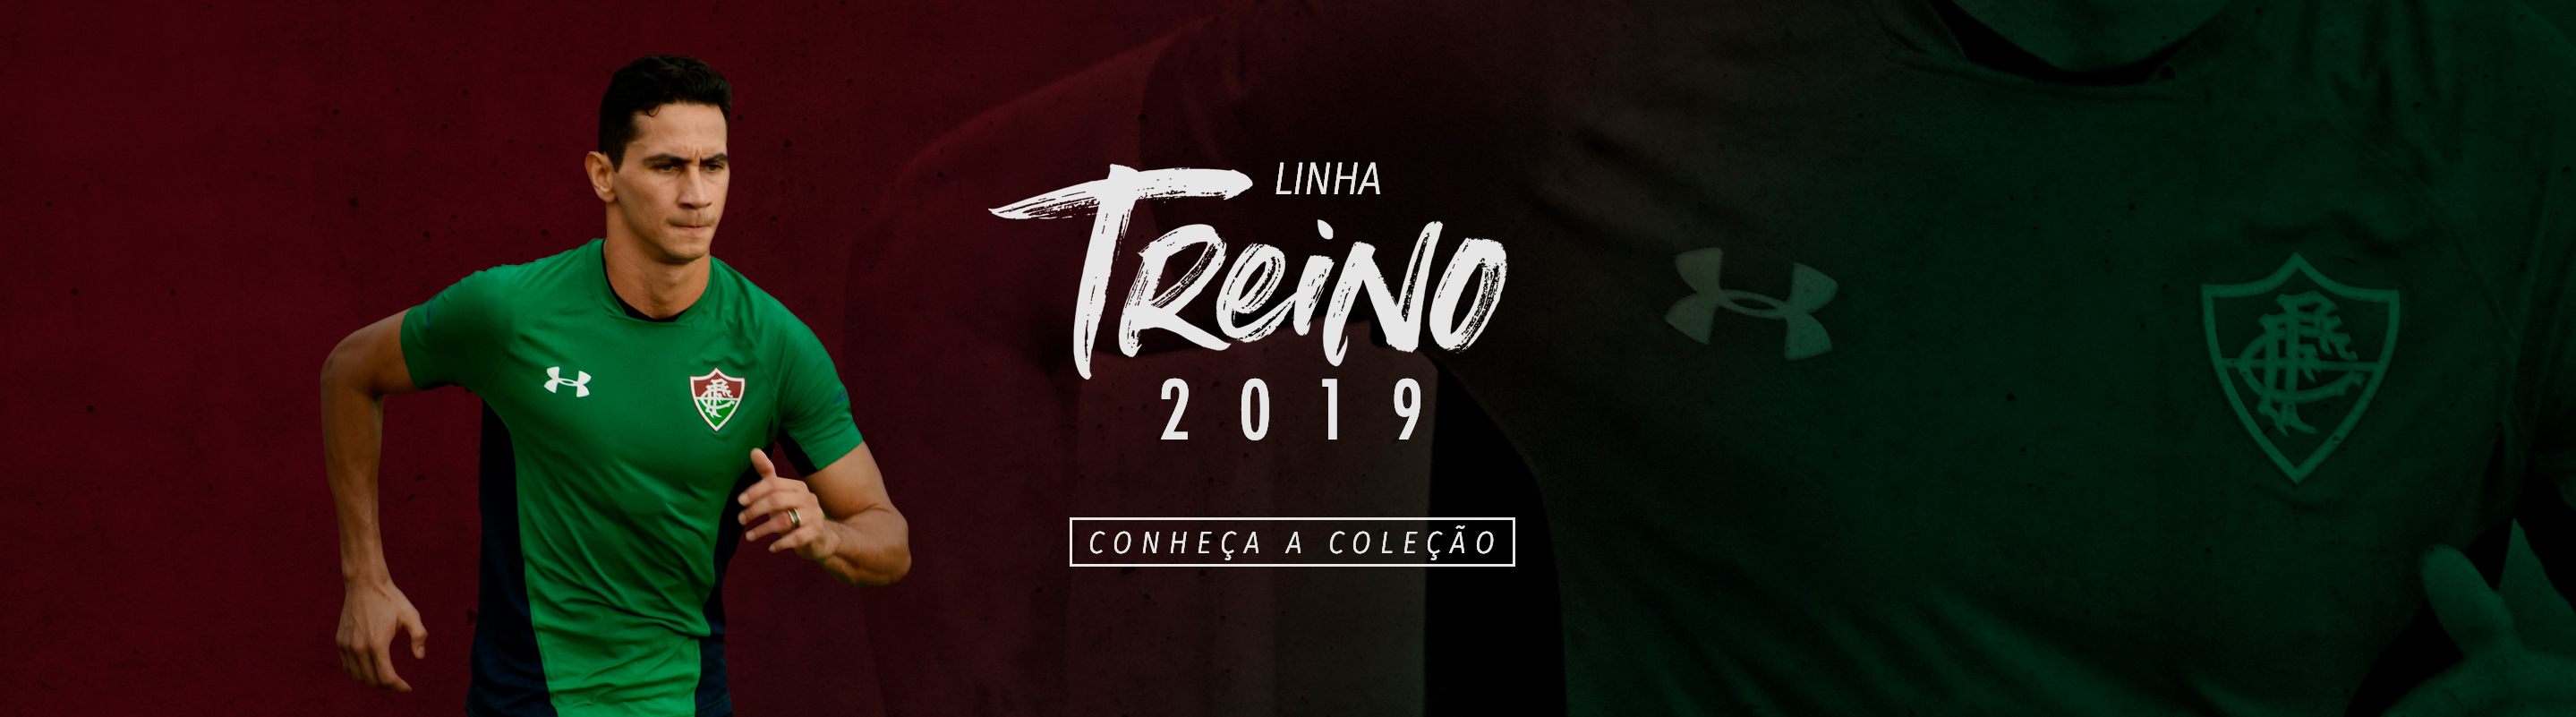 Treino2019